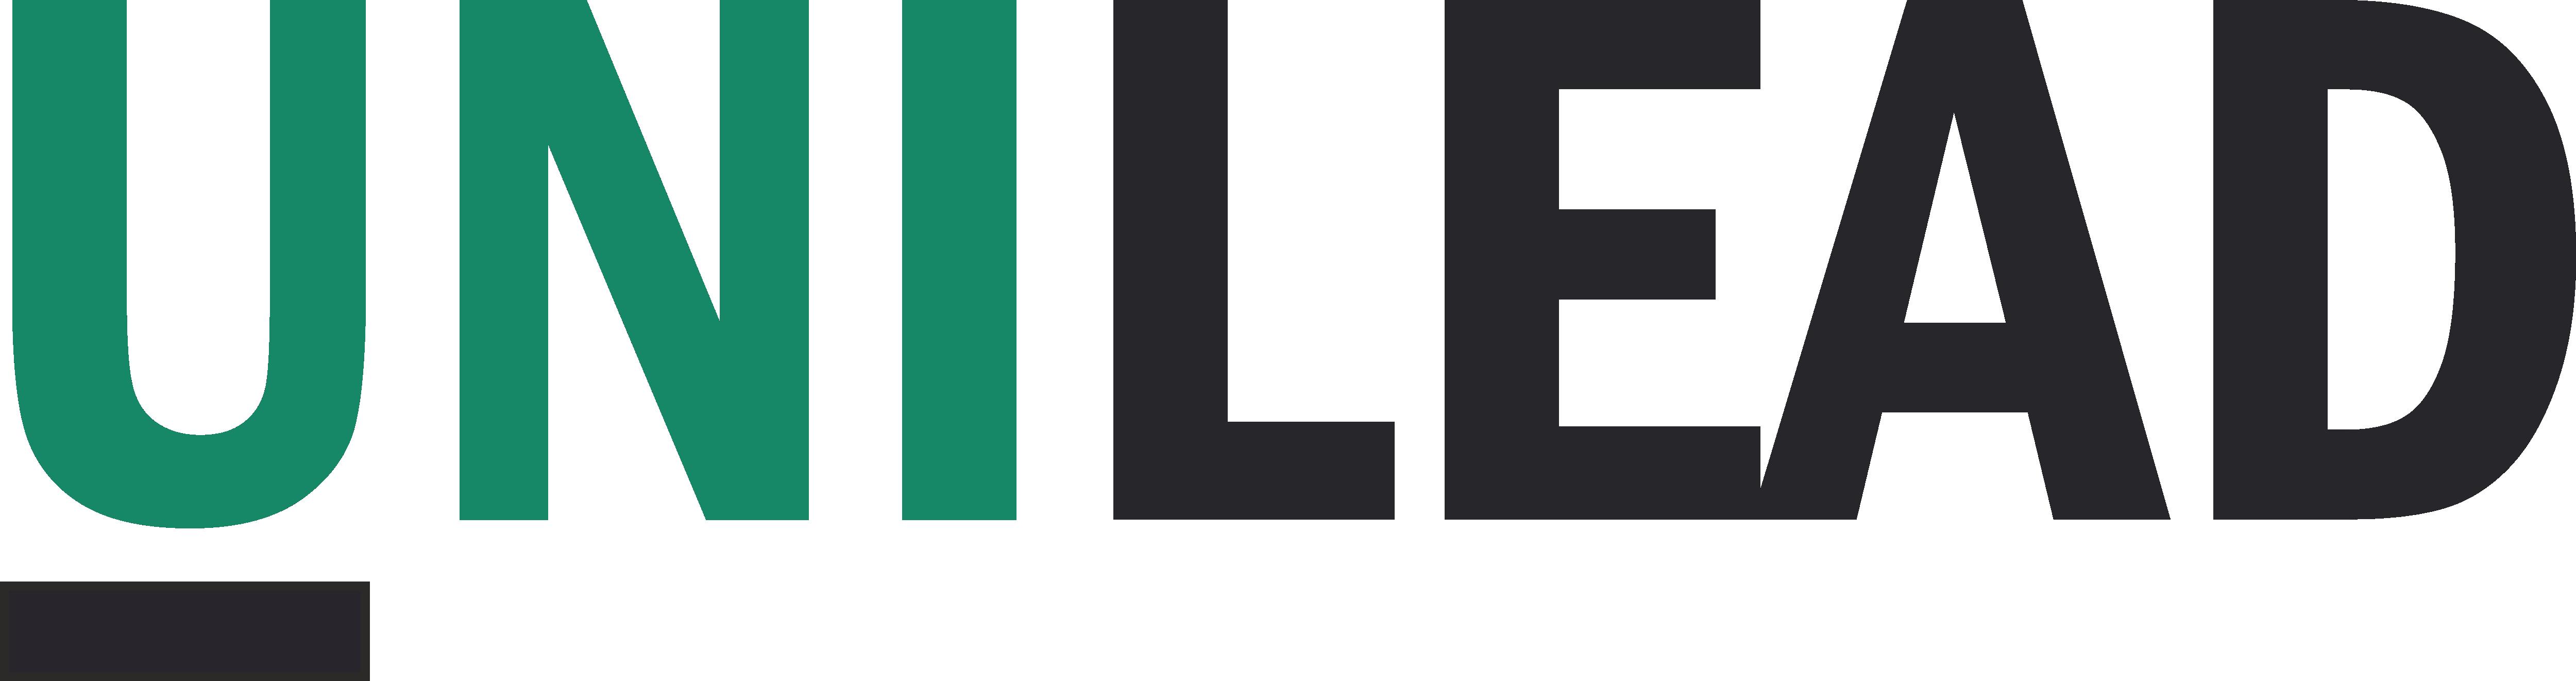 Новый участник RACE 2015 – UniLead Network